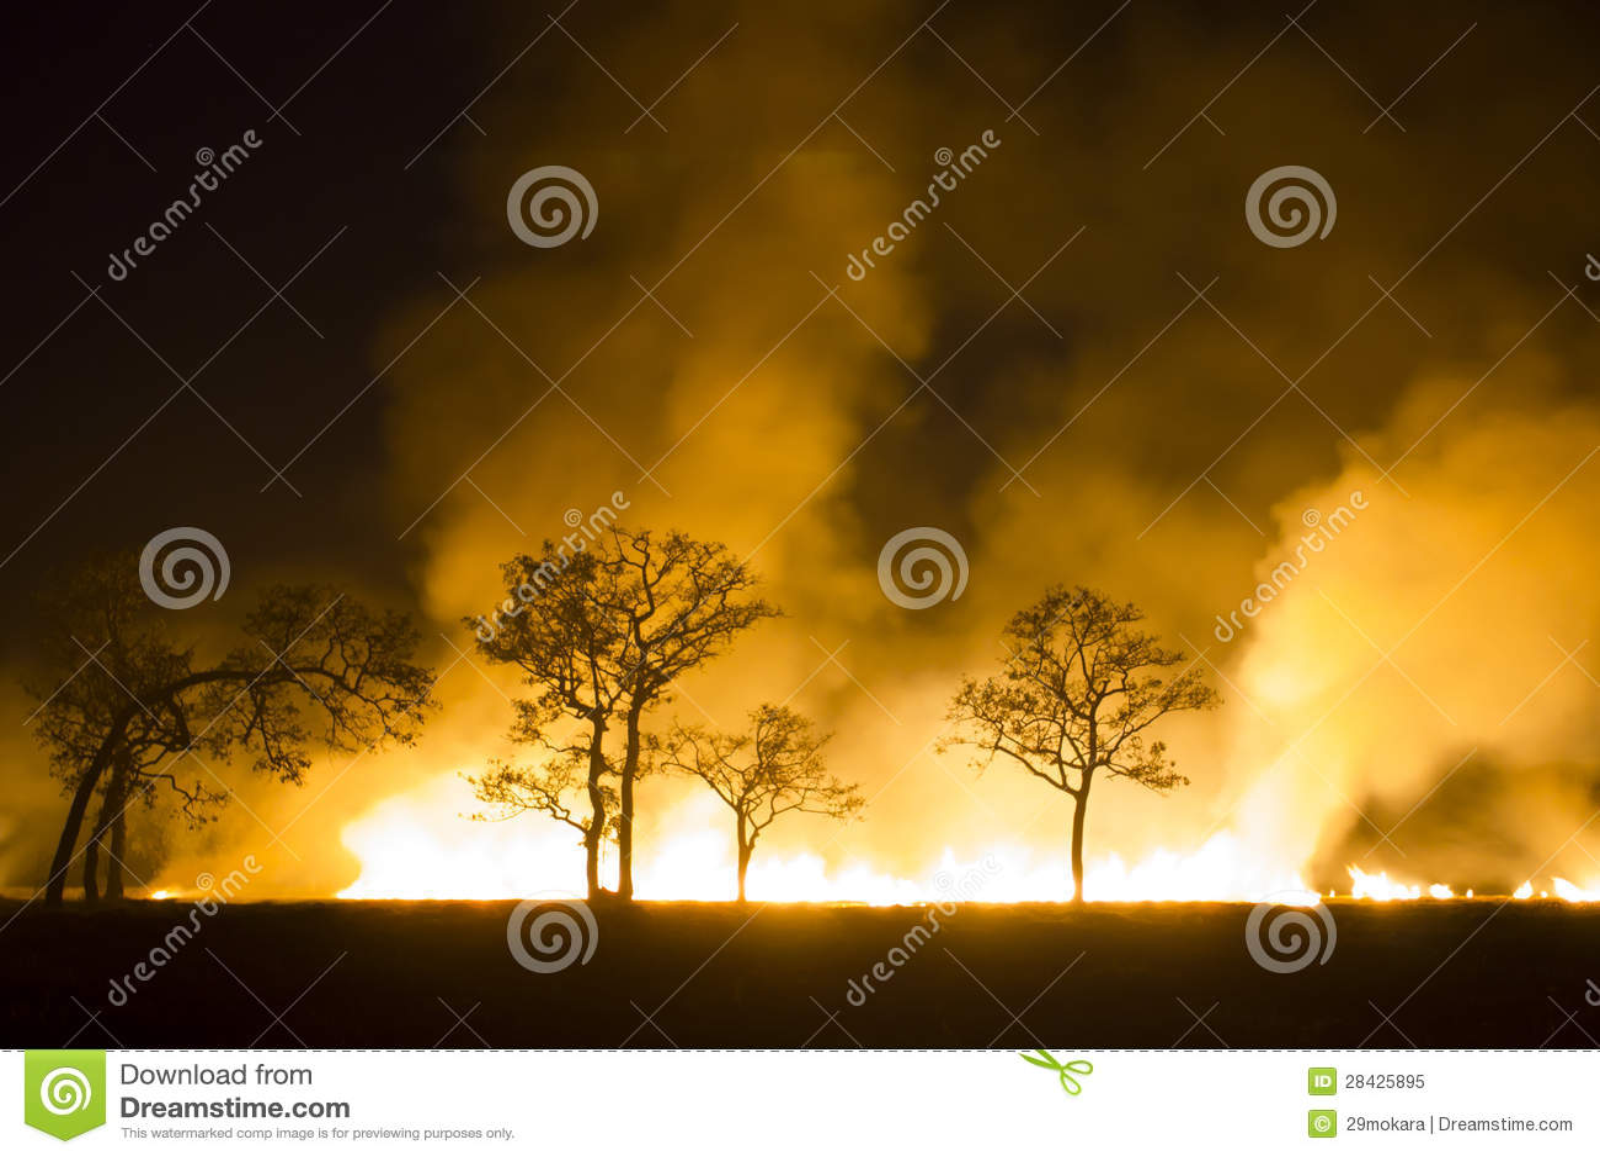 Экосистема пущи лесного пожара горящая разрушена